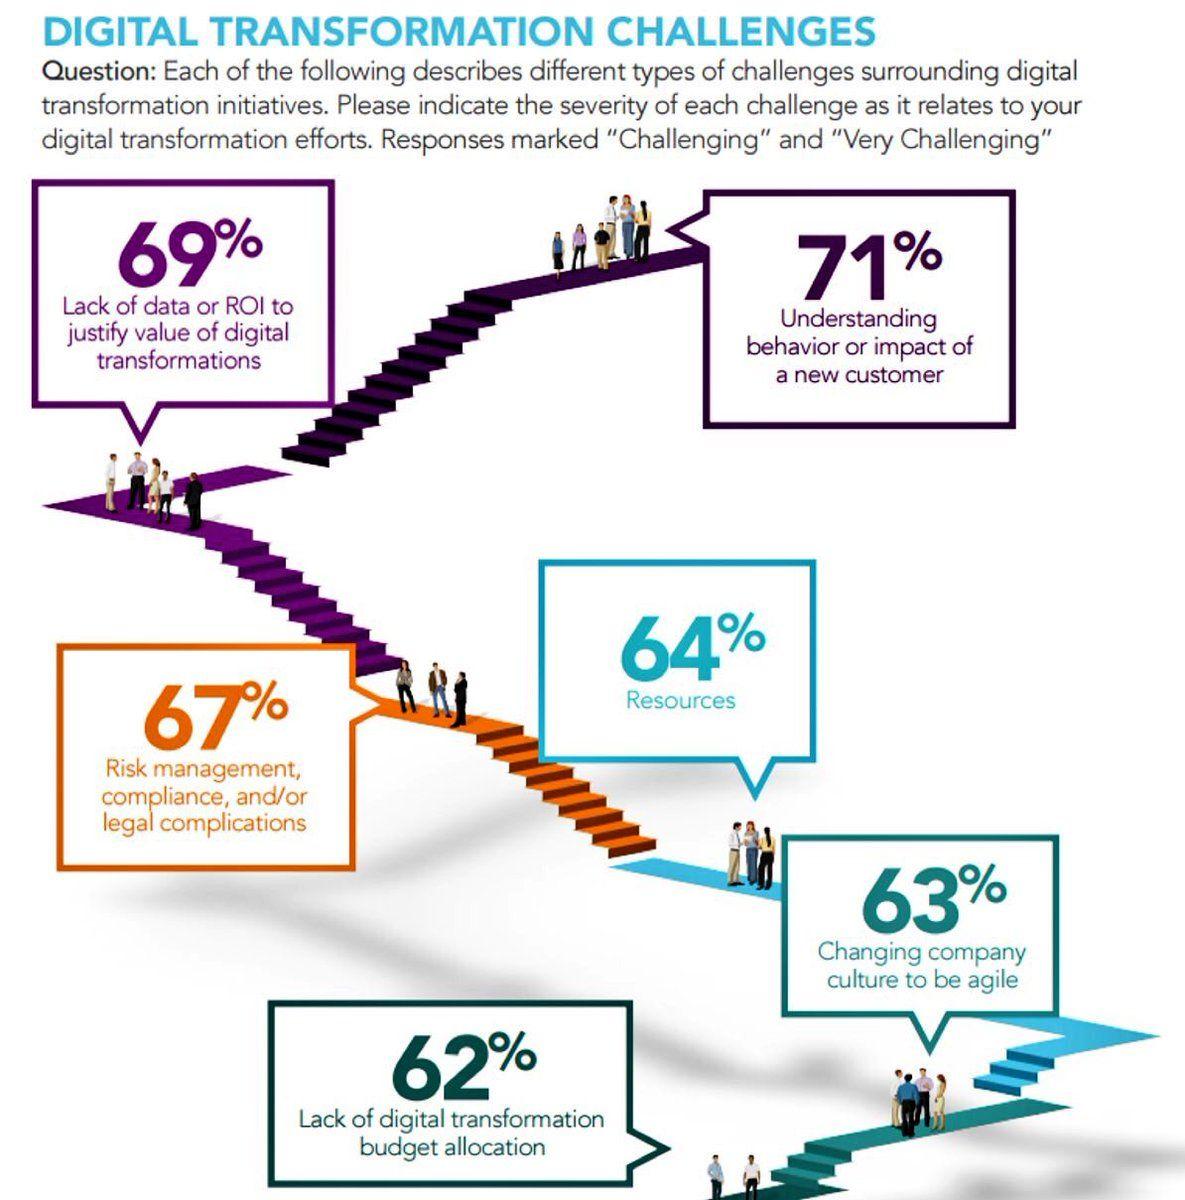 #DigitalTransformation challenges #startups #SMM #IoT #BigData #blockchain #CIO #iIoT #ioE #innovation @ipfconline1<br>http://pic.twitter.com/Li3rBZ6cLr